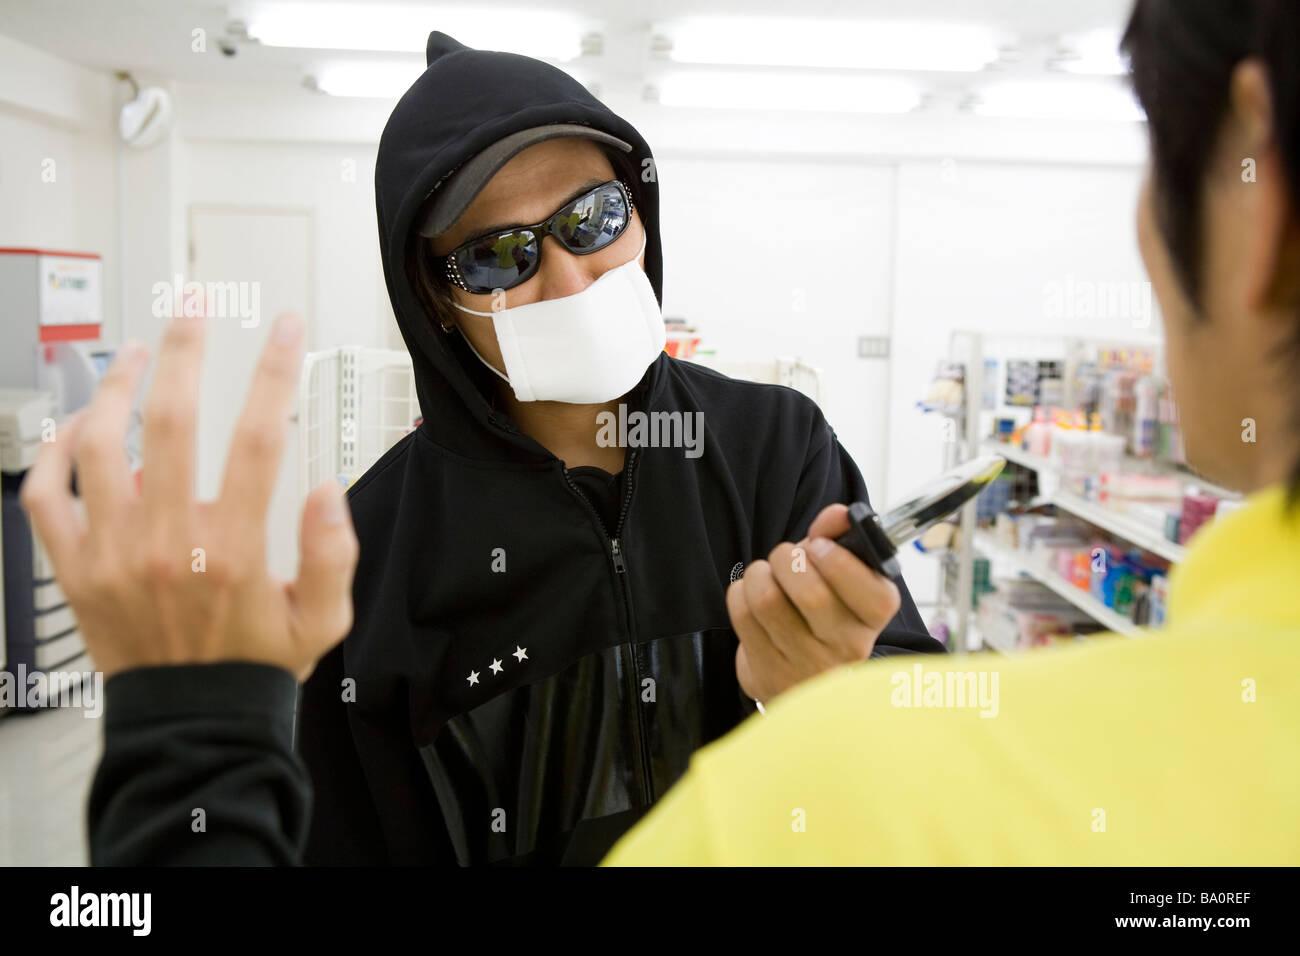 Robber threatening convenience store clerk - Stock Image